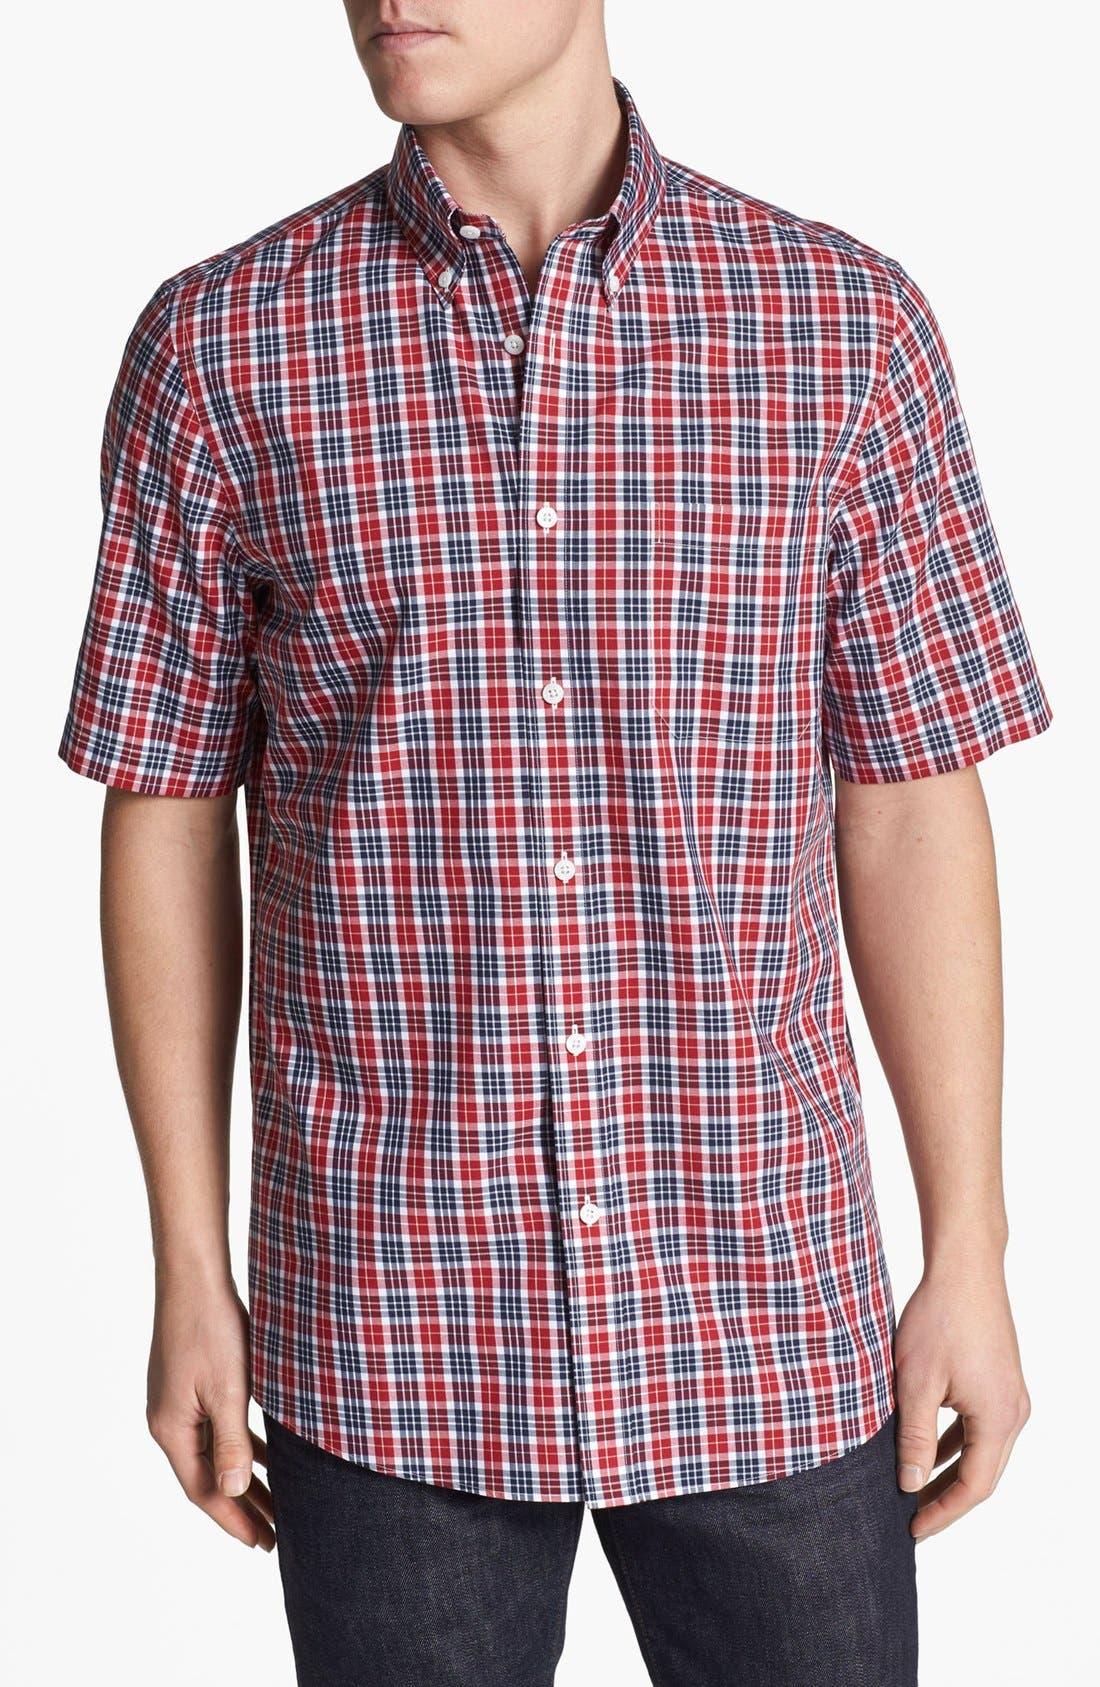 Alternate Image 1 Selected - Nordstrom Smartcare™ Short Sleeve Poplin Sport Shirt